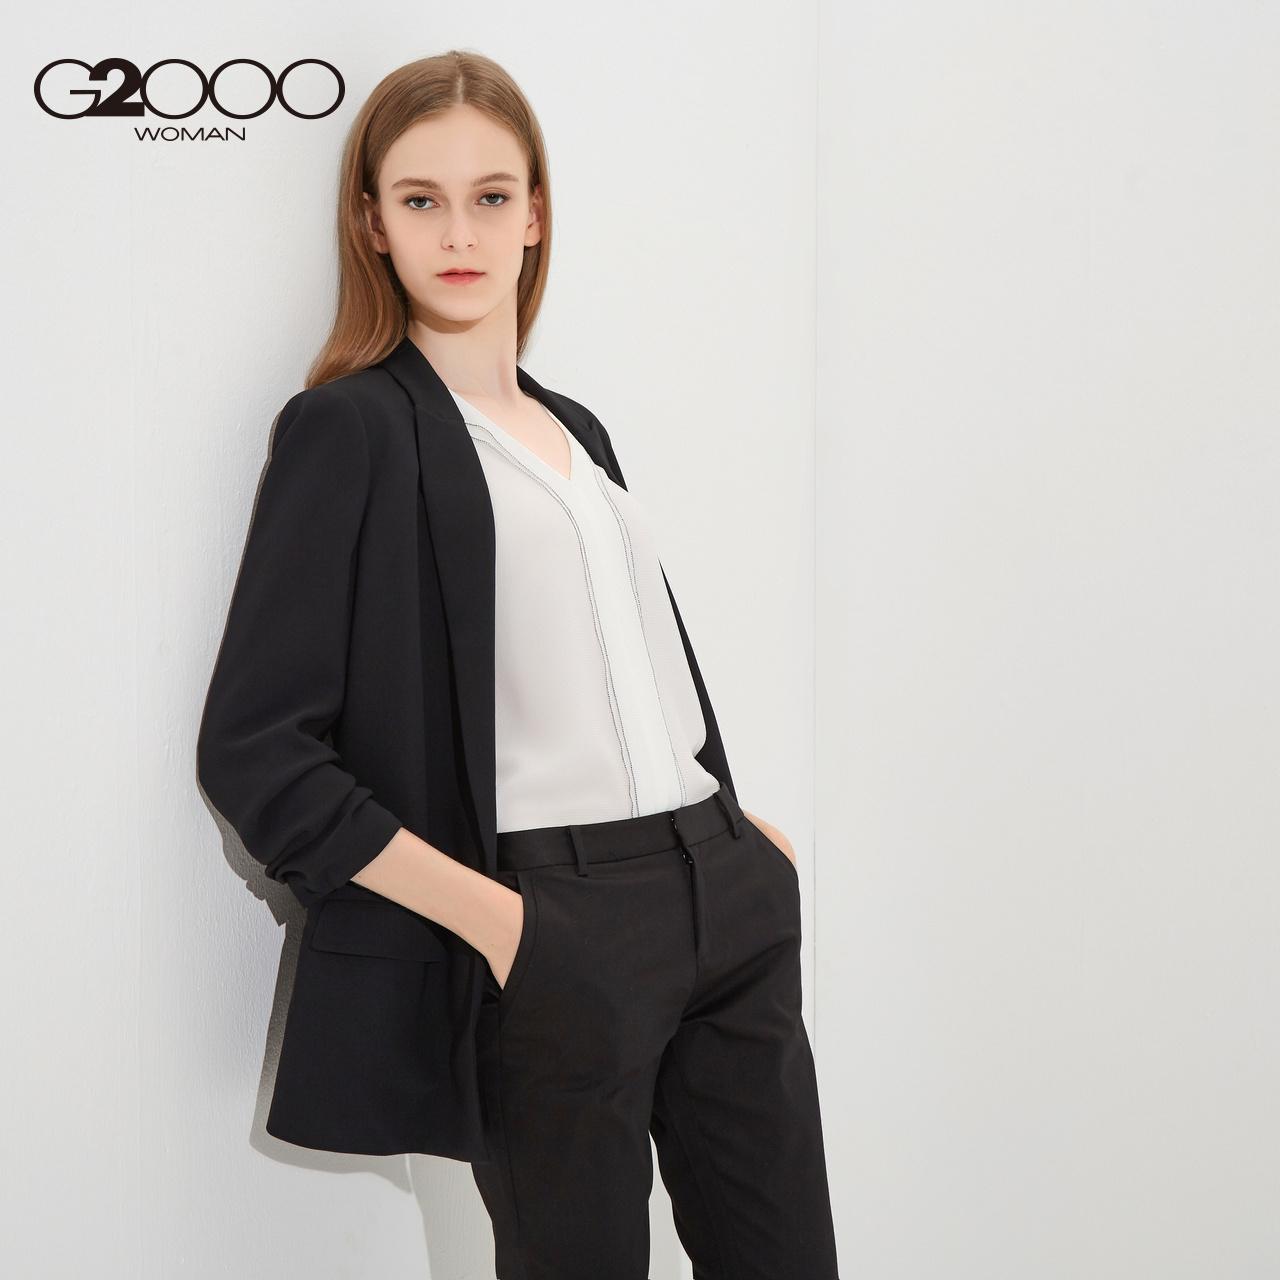 G2000新款商务休闲西服外套 2018春季简约褶皱九分袖通勤女装西装